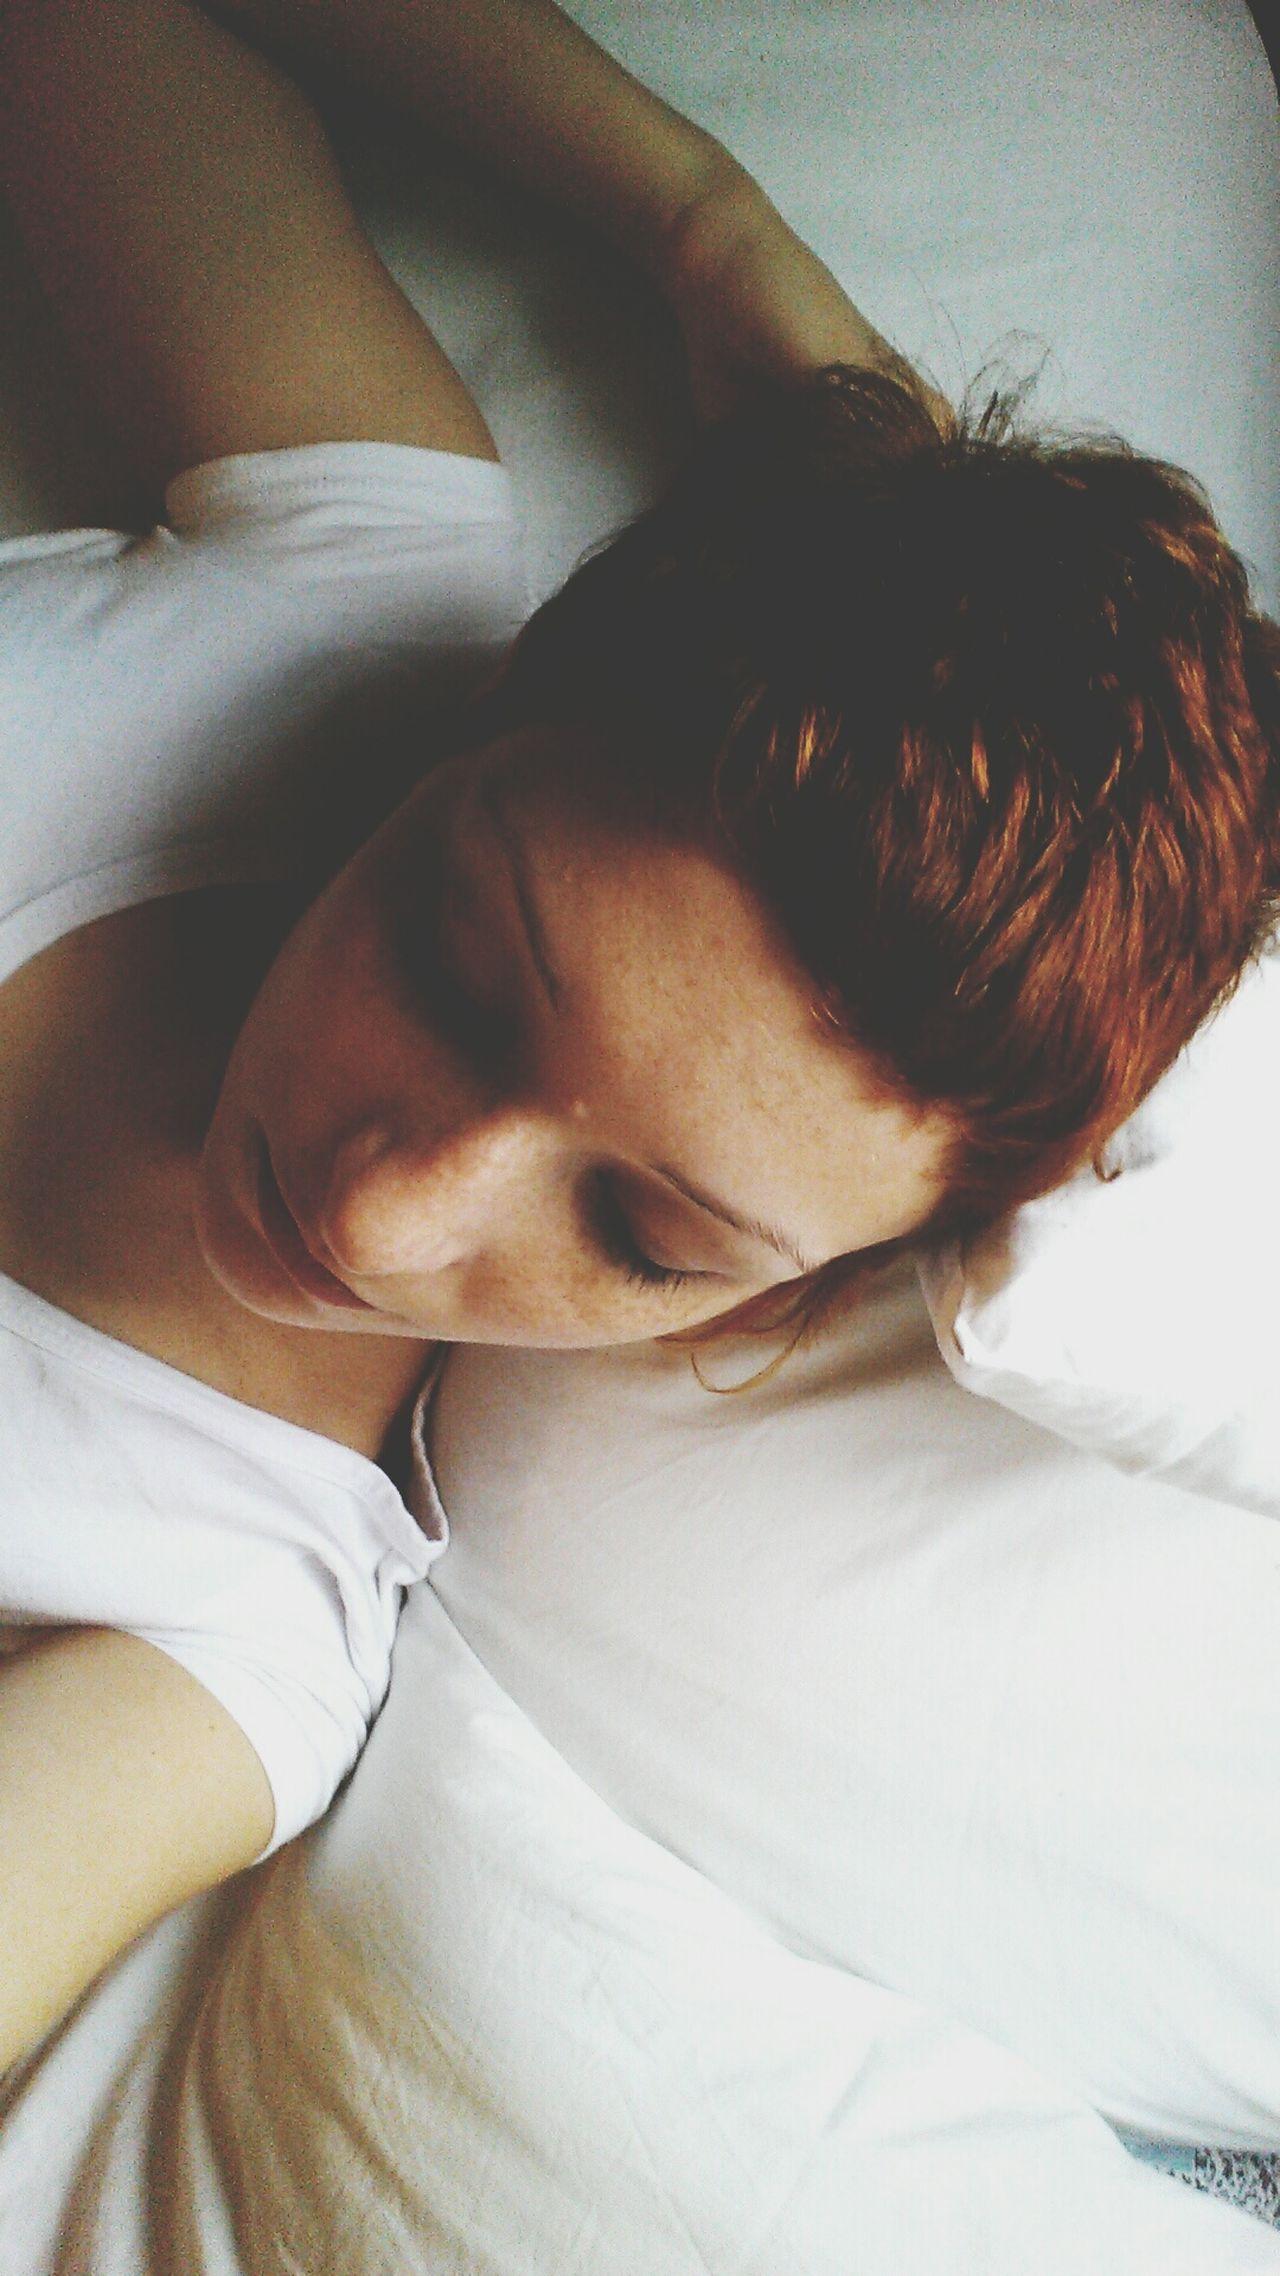 Redhairdon'tcare Redheadsdoitbest Redhead Fashion Hair Freckles. ❤